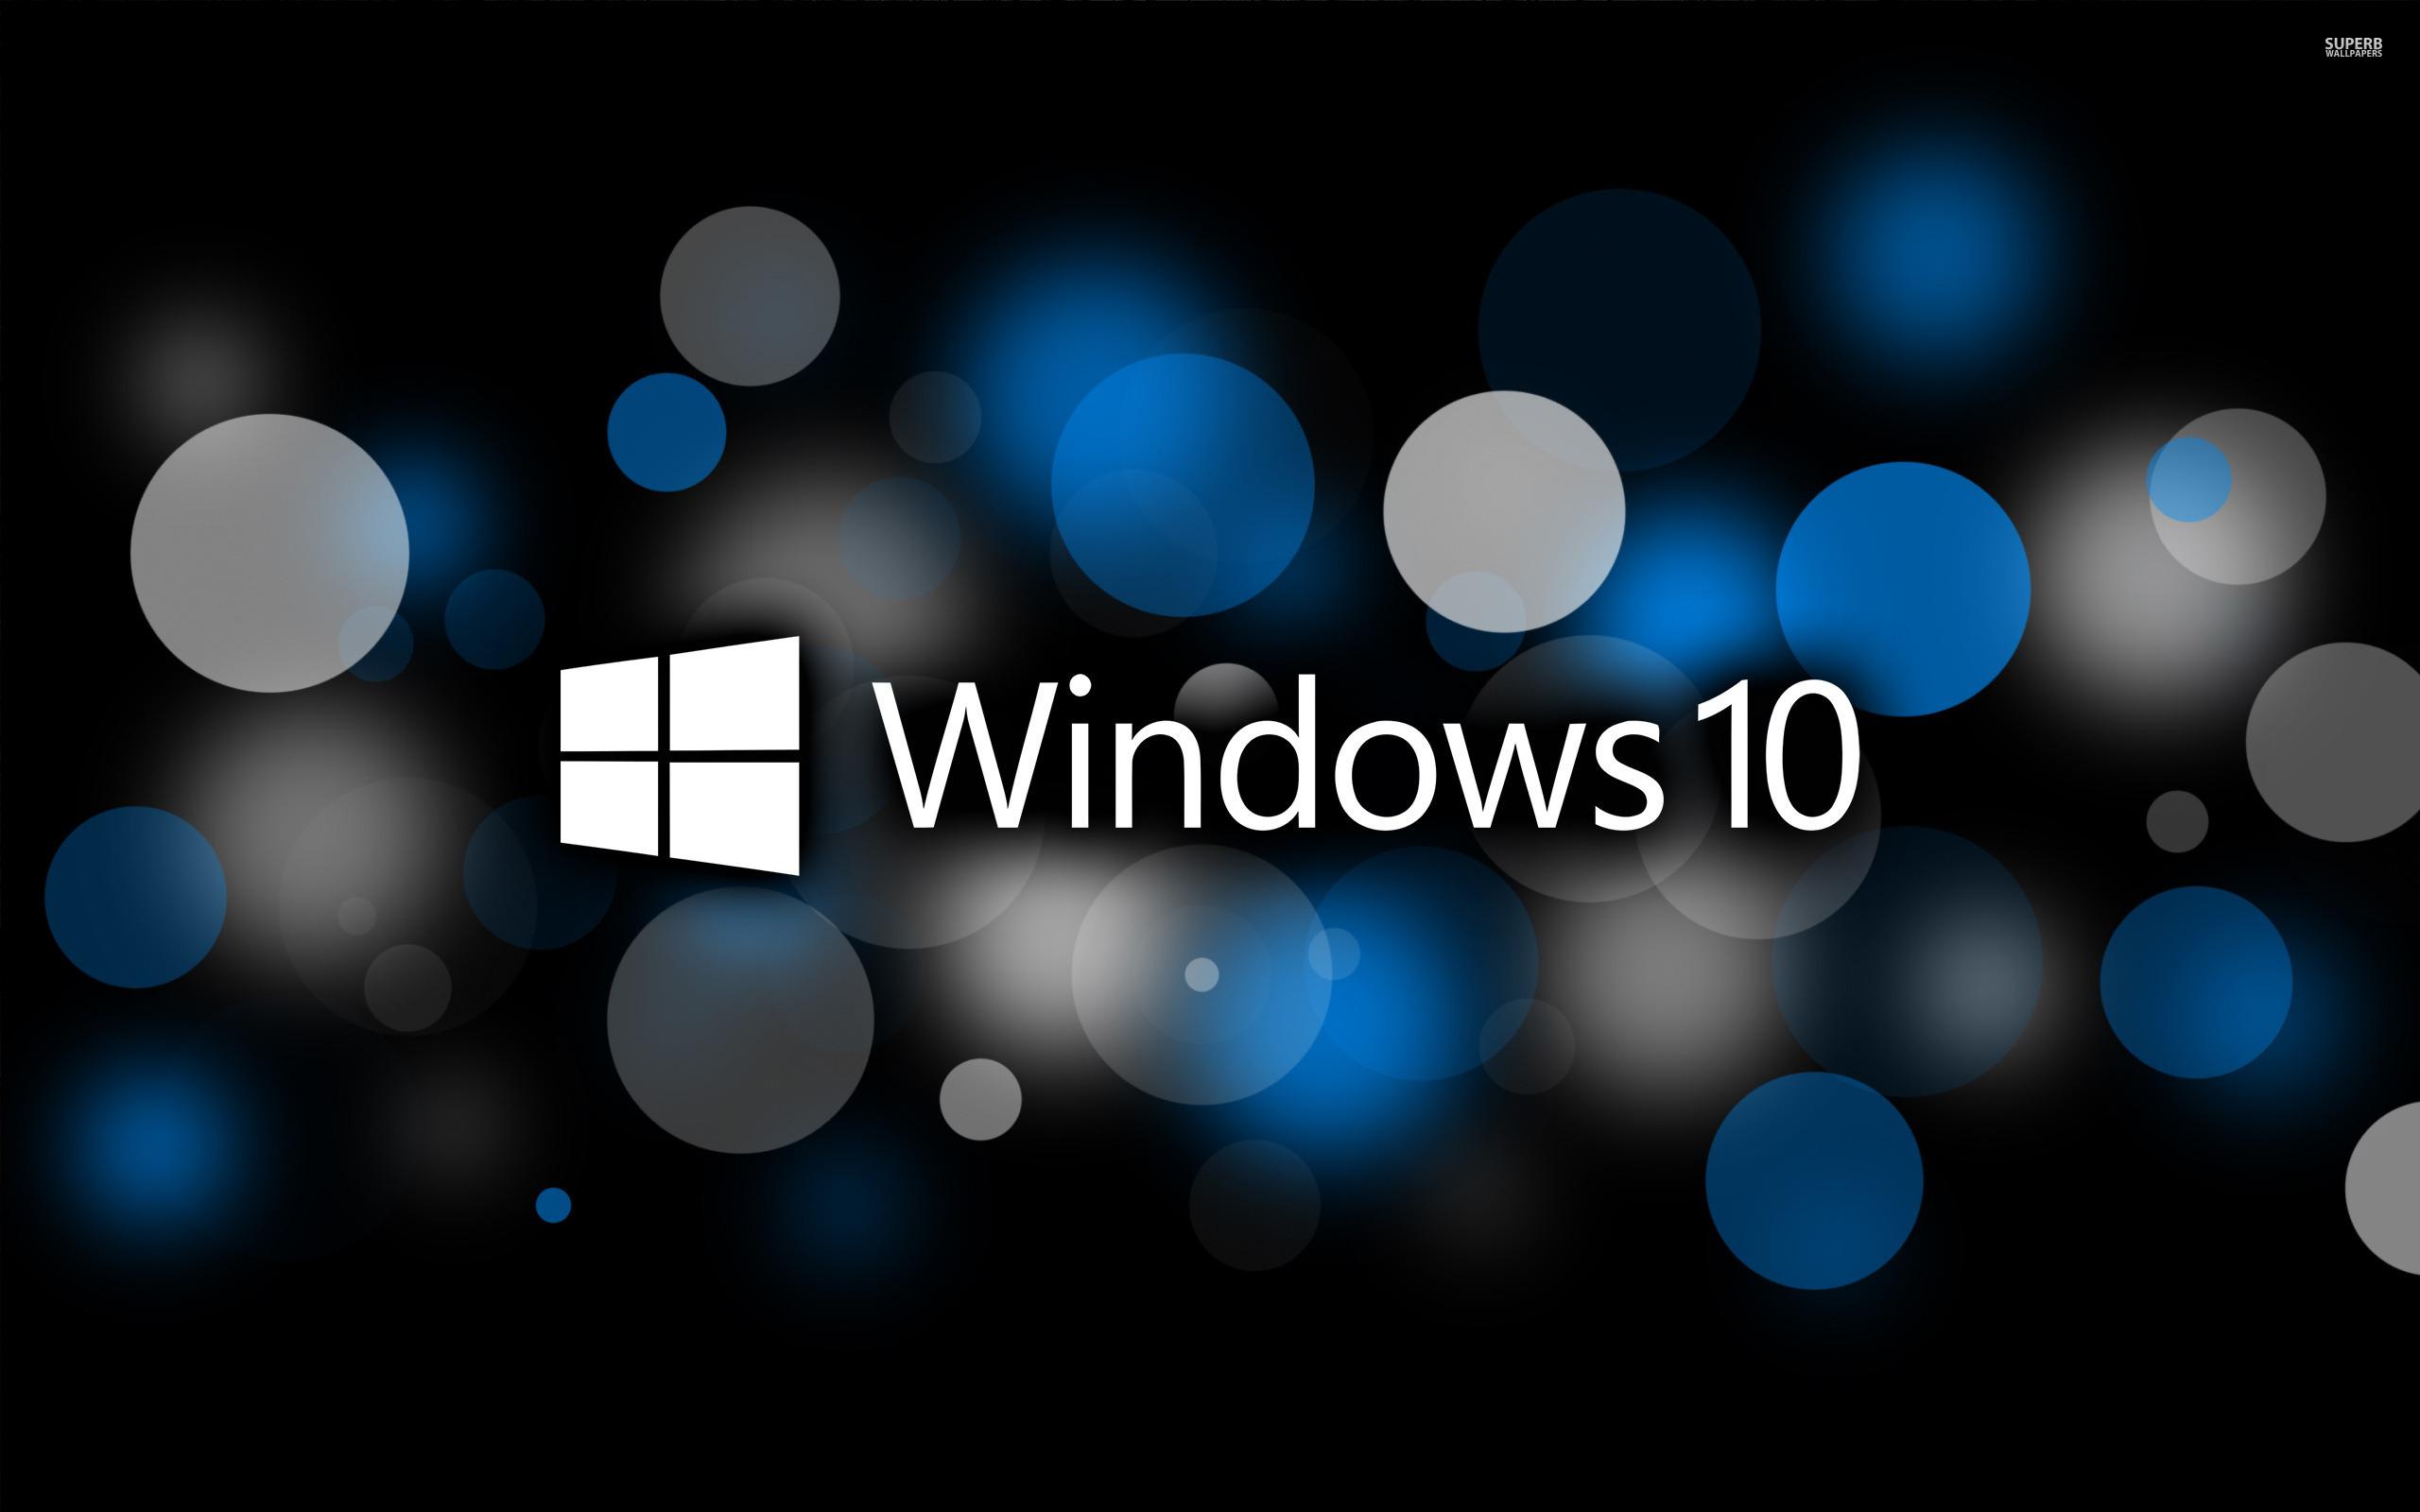 windows 10 hd desktop wallpaper 14125 wallpaper download hd